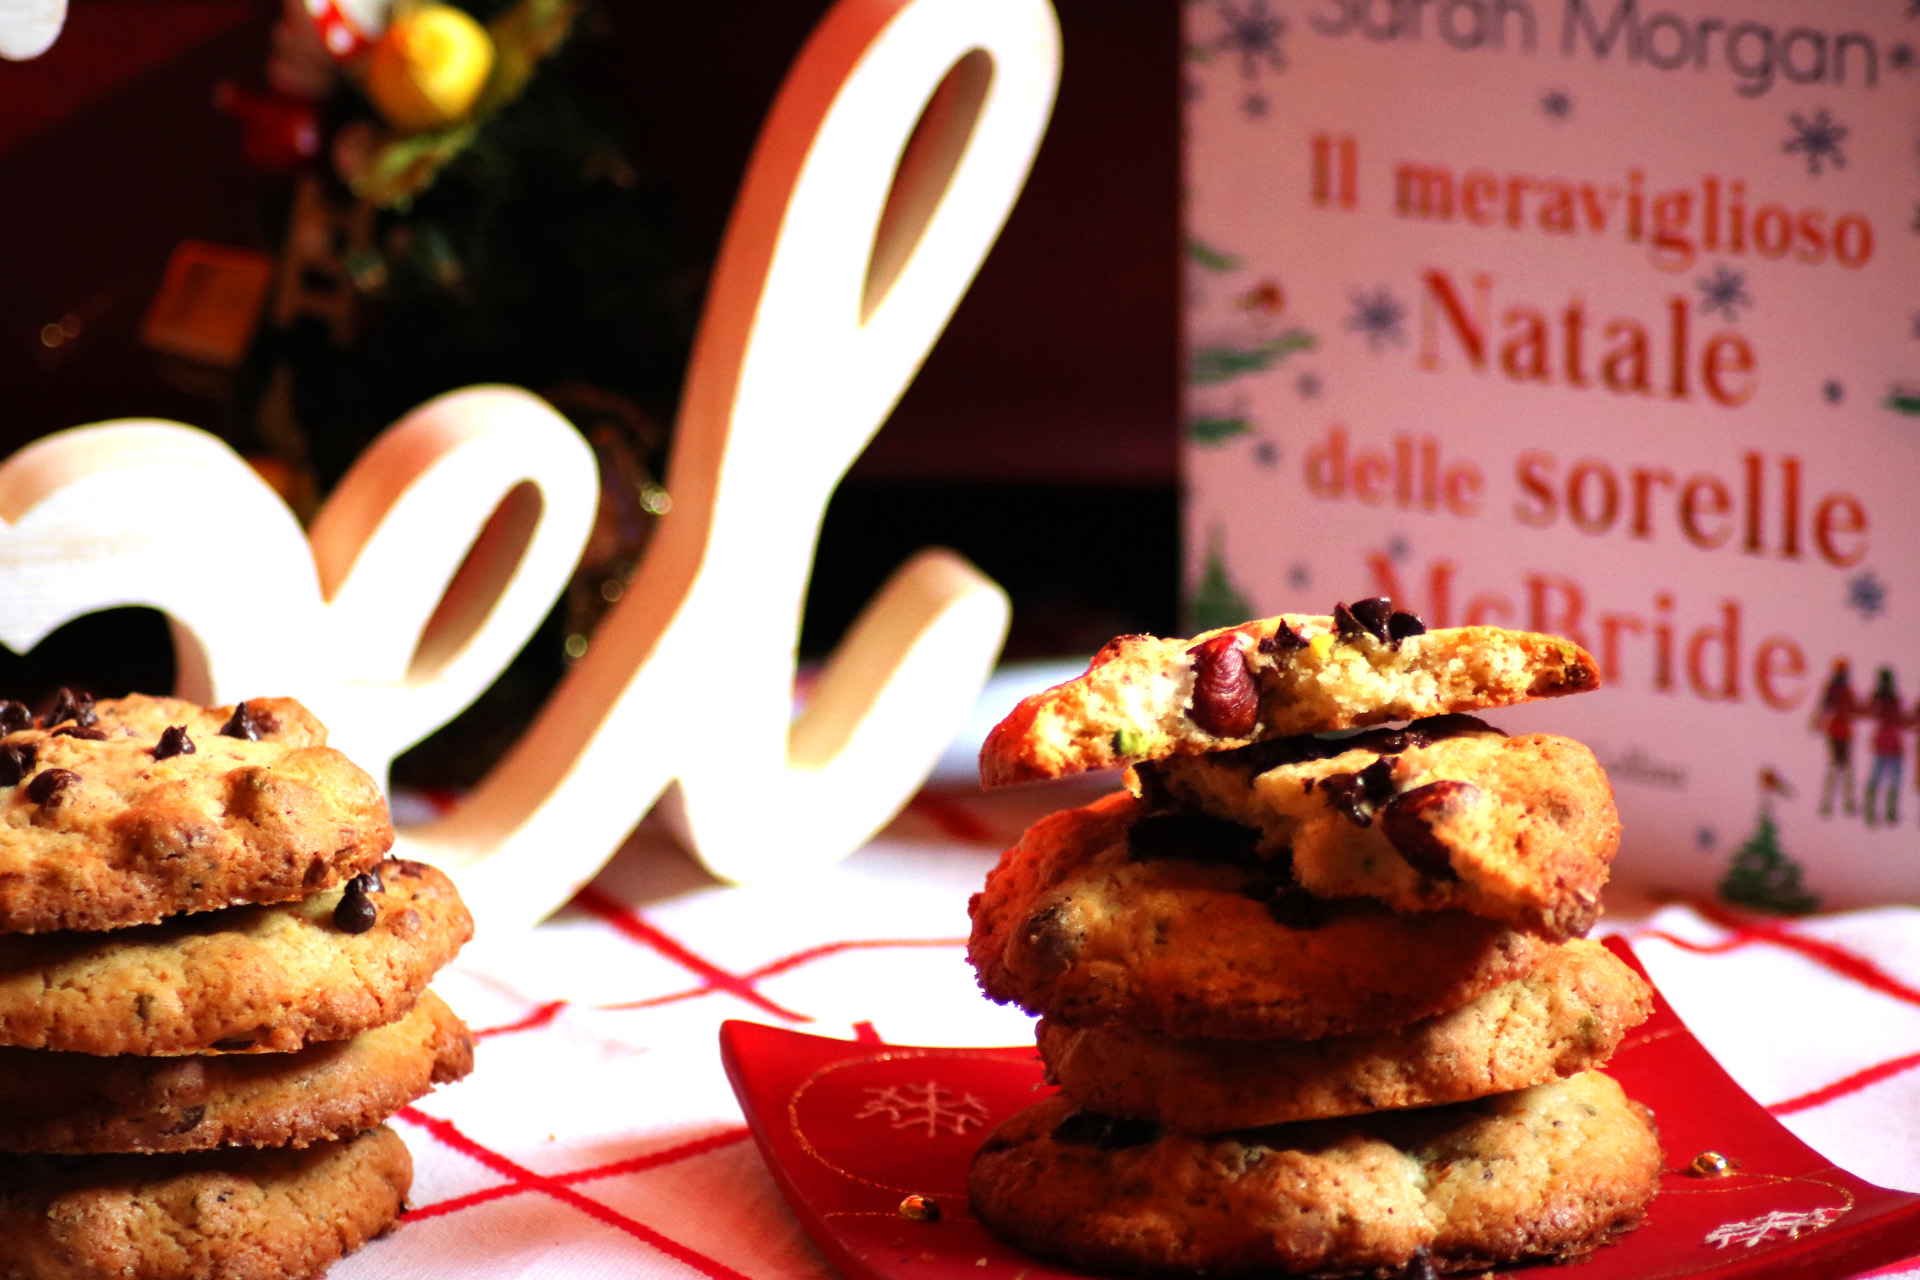 Storia e ricetta dei Cookies